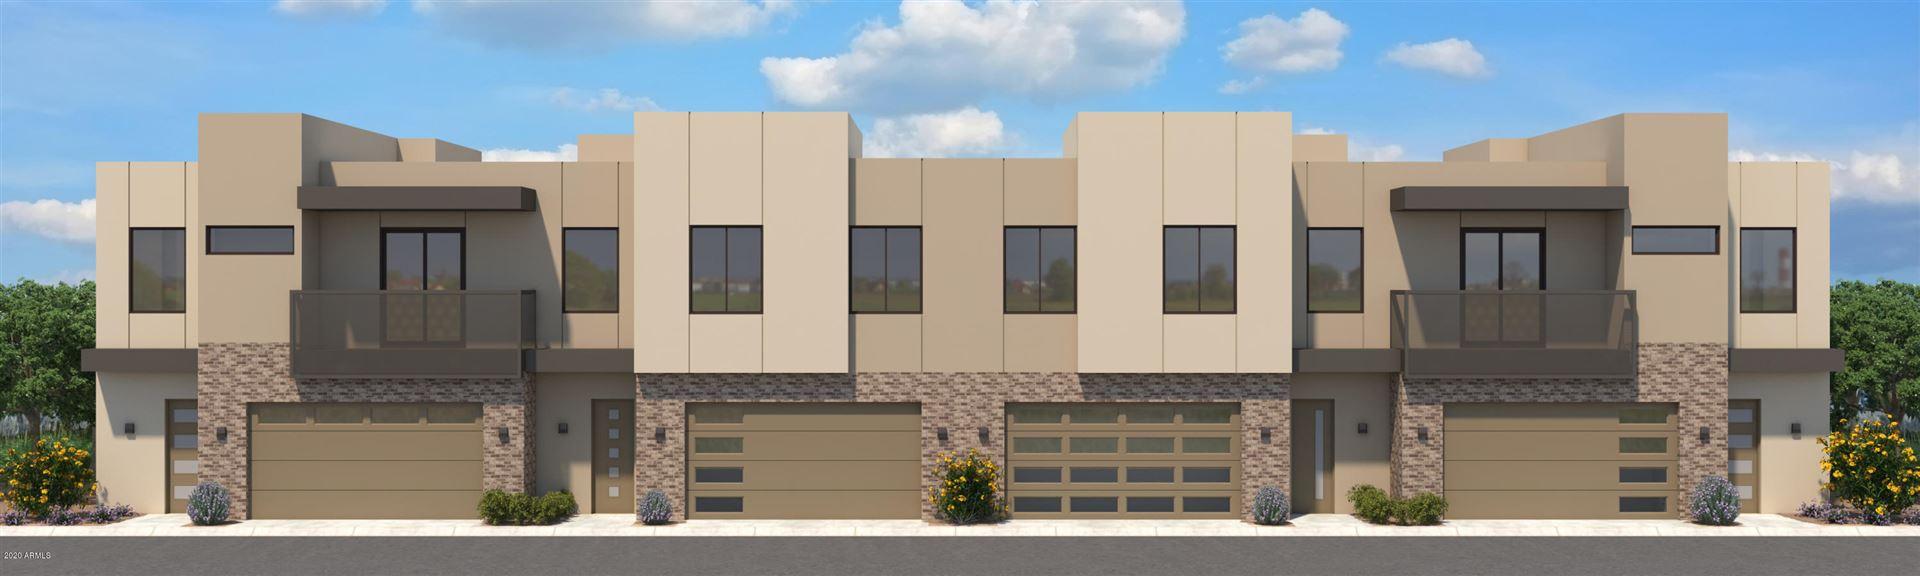 901 S Smith Road #1048, Tempe, AZ 85281 - MLS#: 6180339